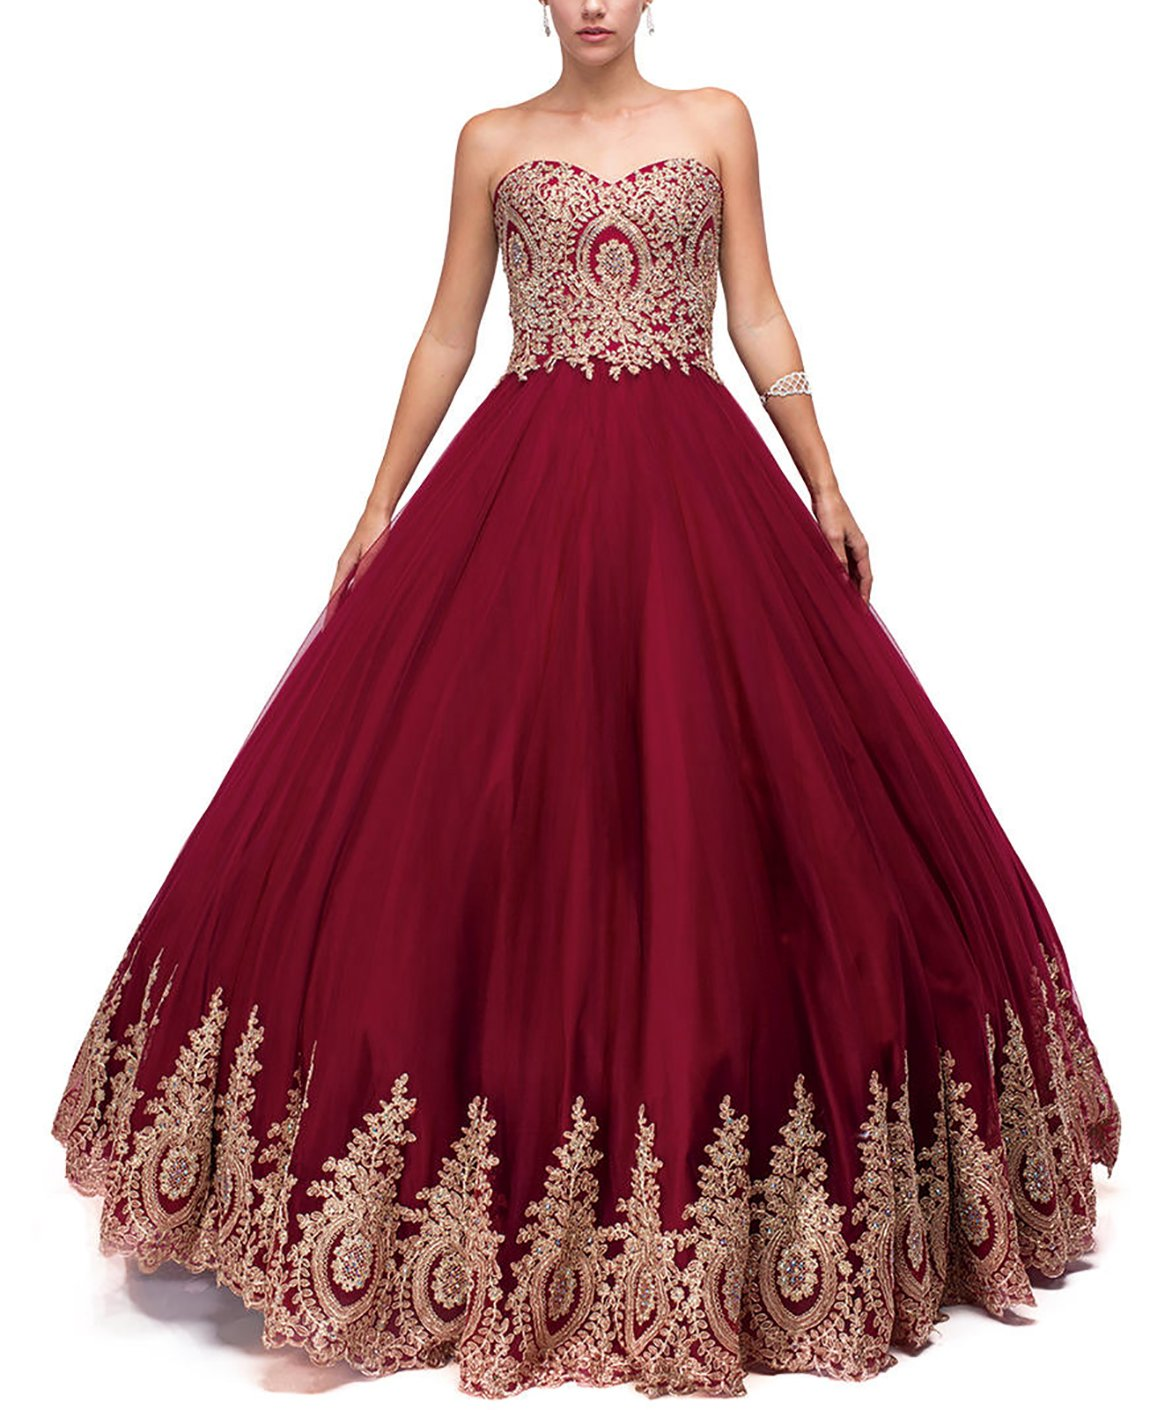 523dc5e1ee1 DarlingU Women s Ball Gown Sweetheart Quincenara Dress Appliques Formal Prom  Evening Gowns Burgundy 14